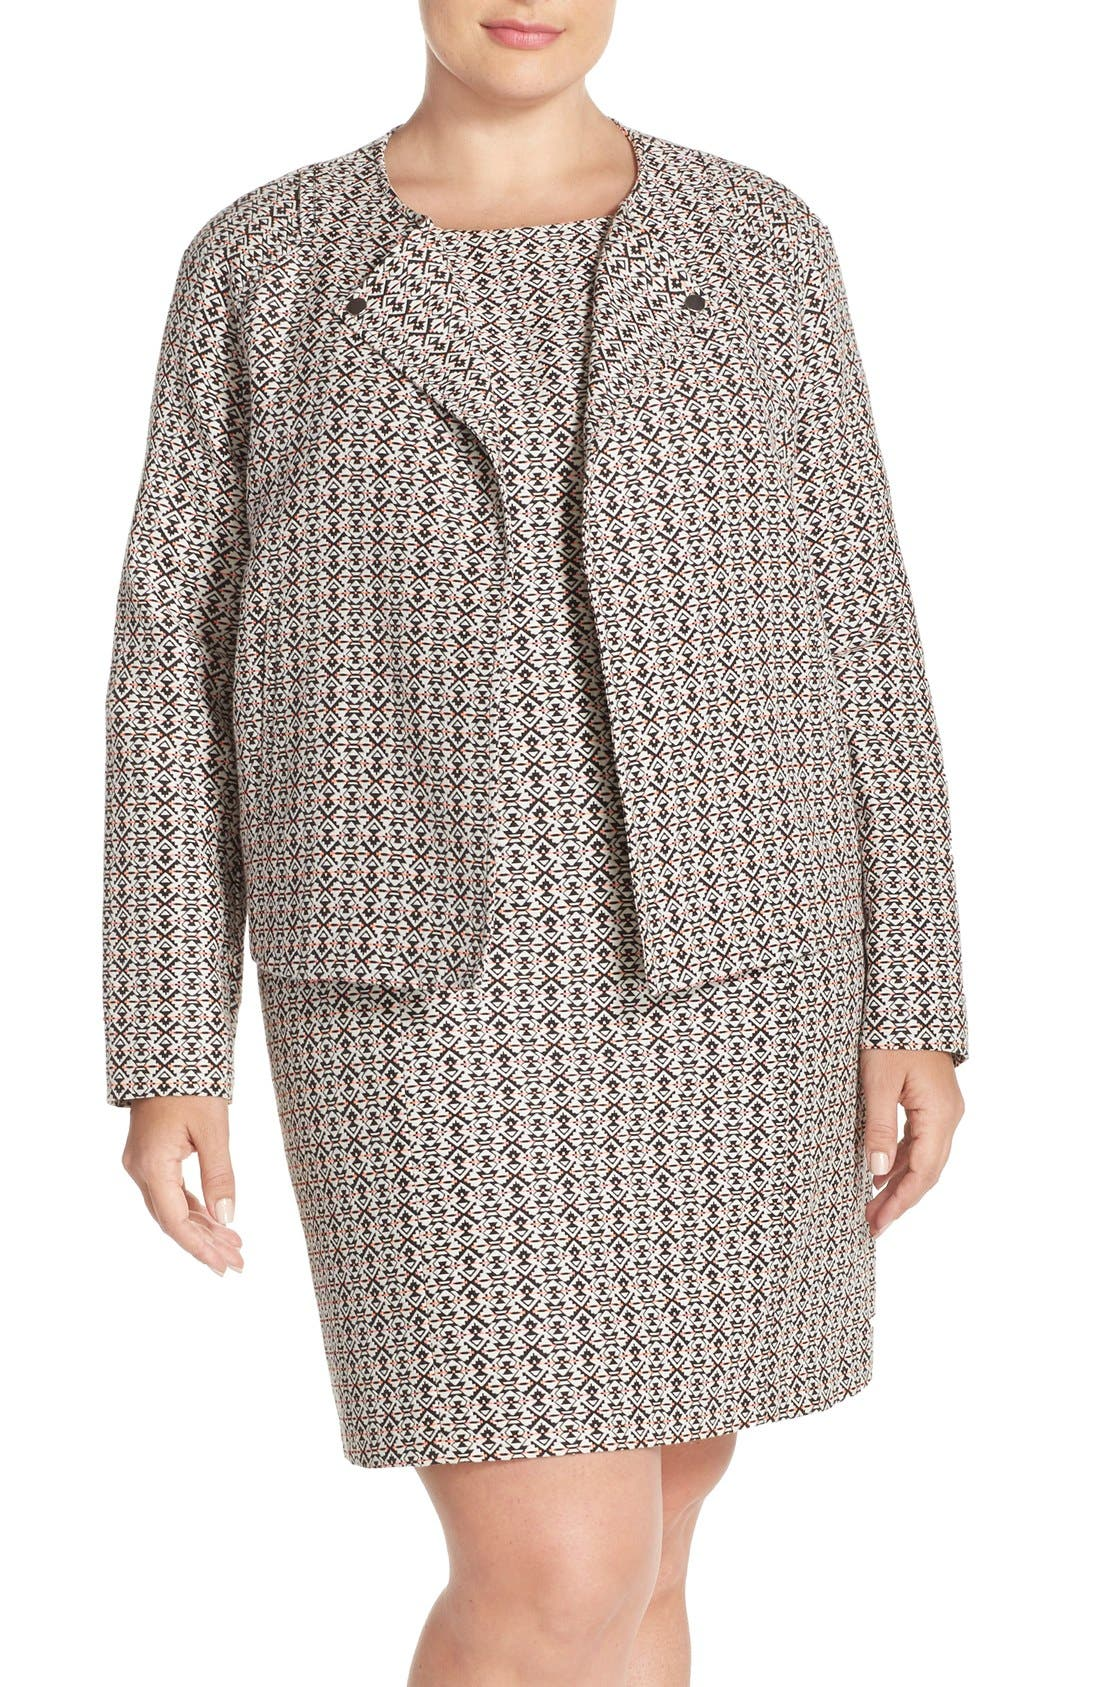 Main Image - Tart 'Aviana' Print Collarless Jacket (Plus Size)